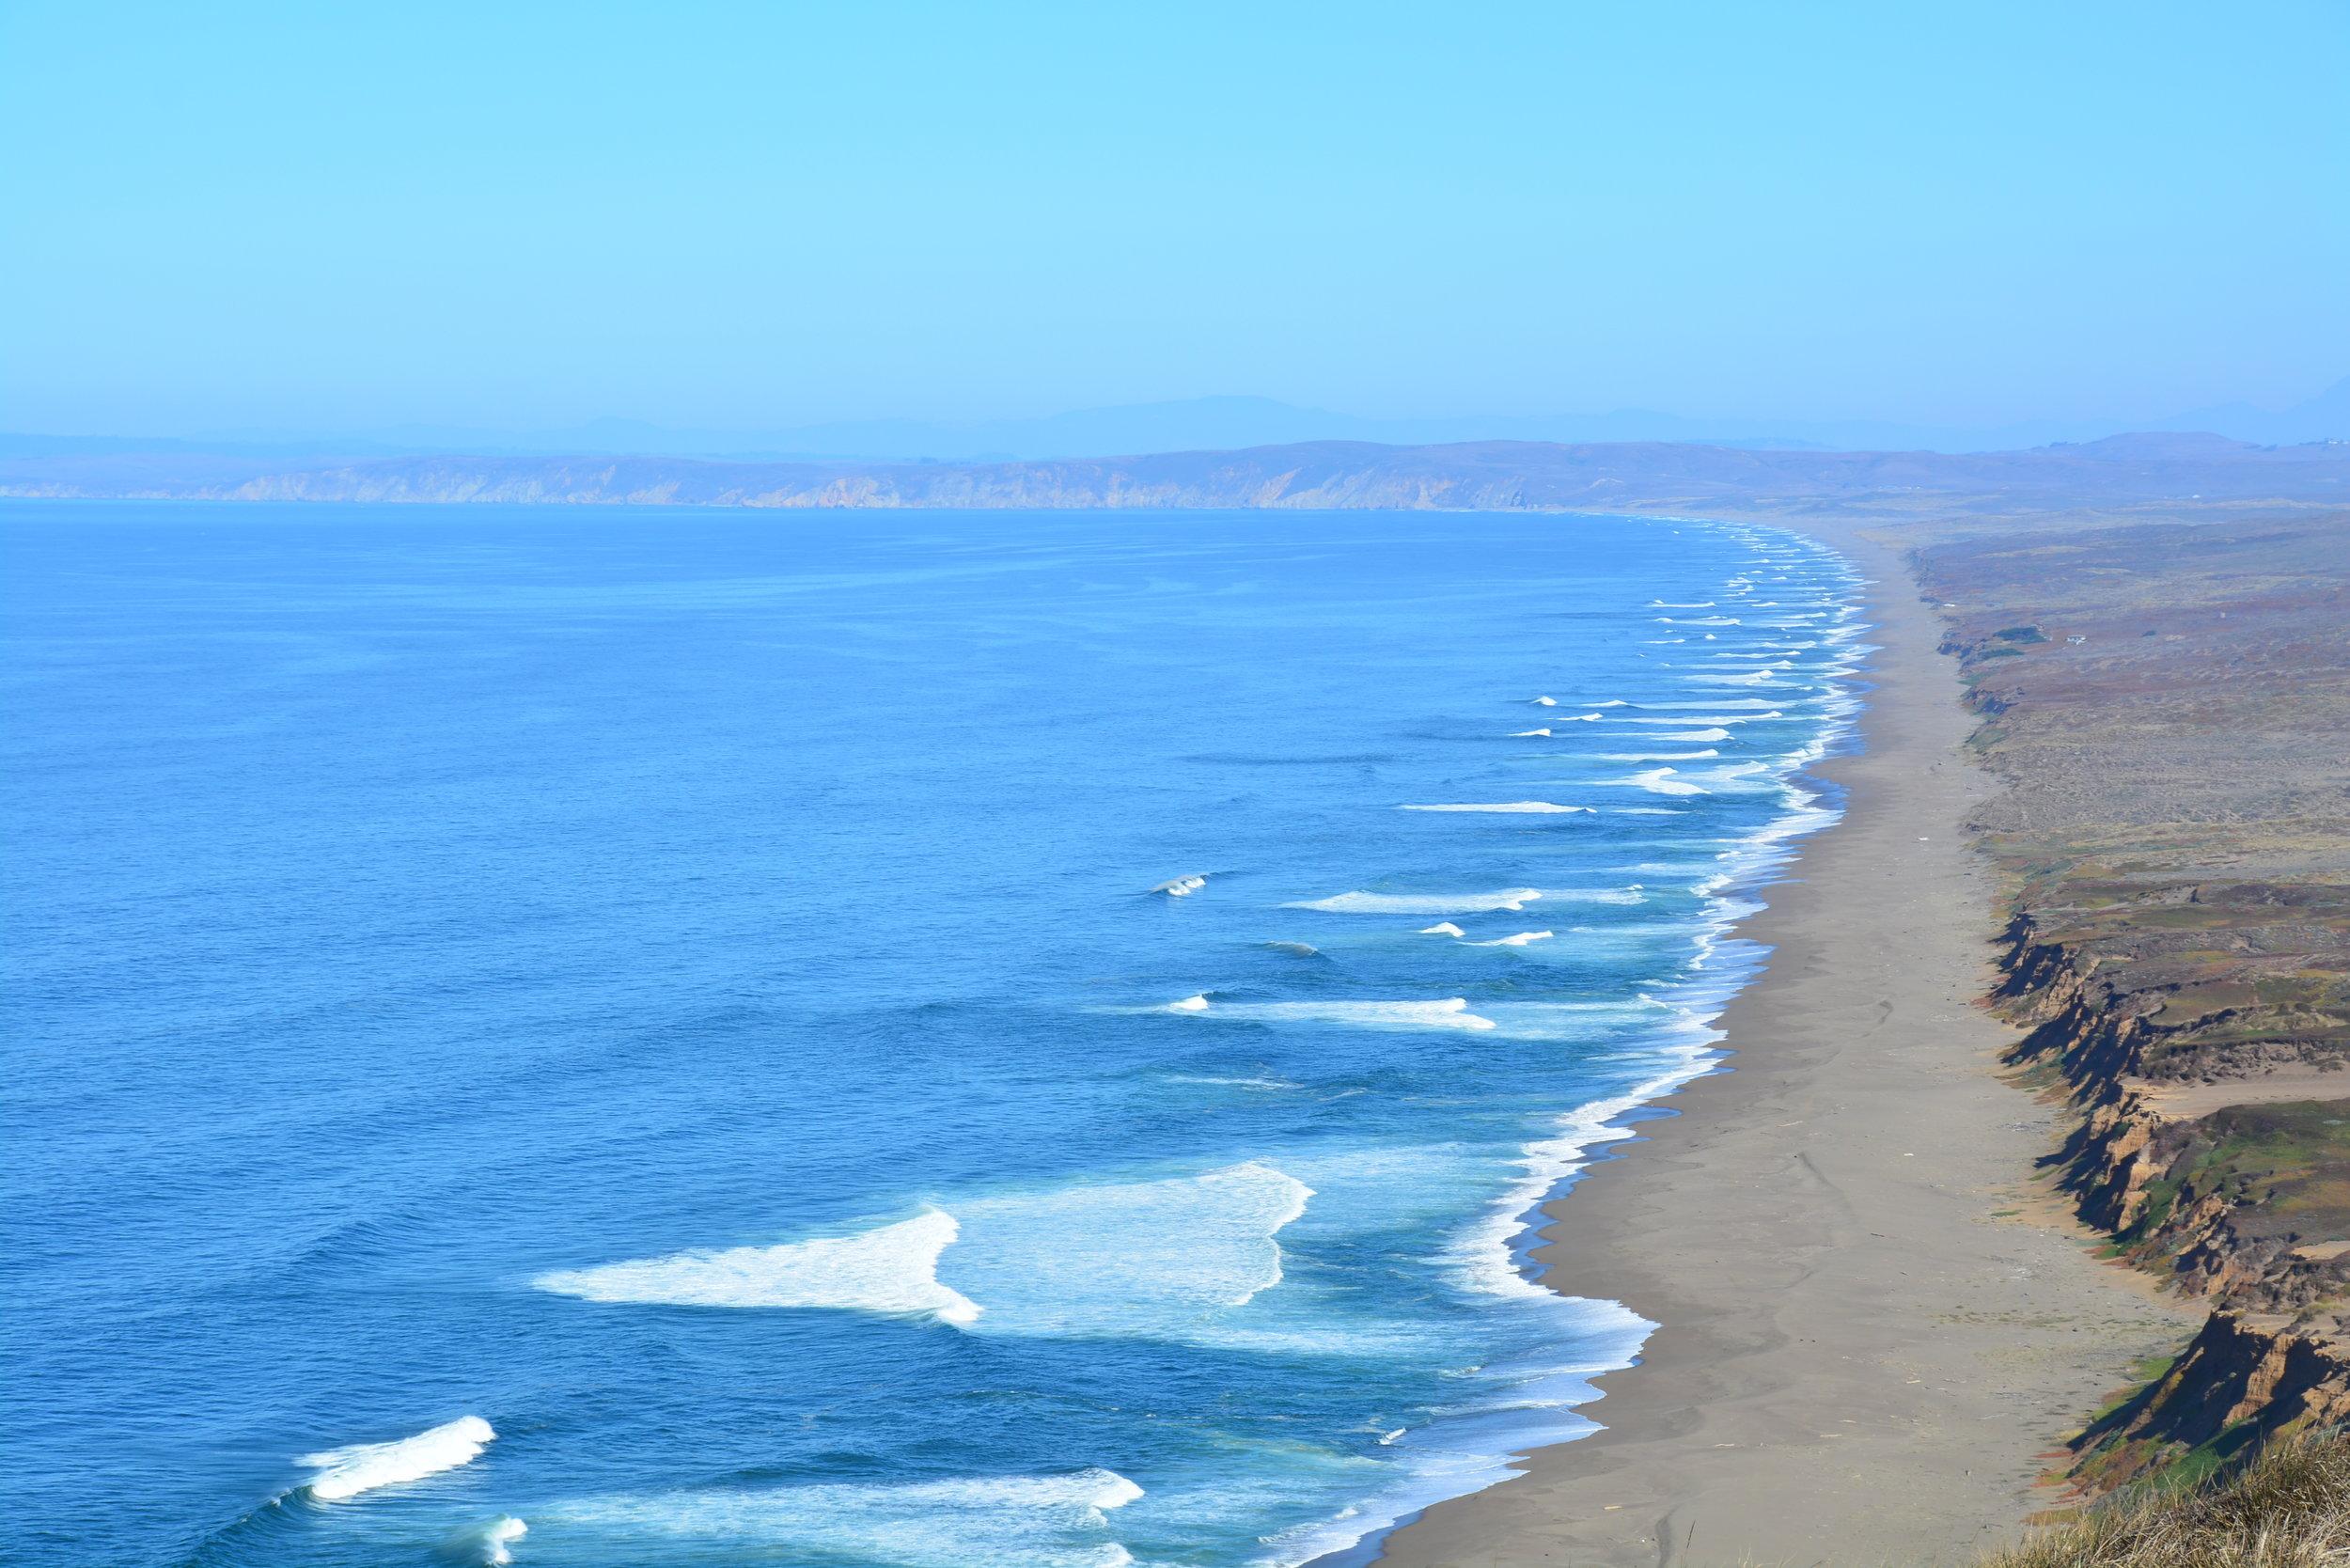 Point Reyes, CA